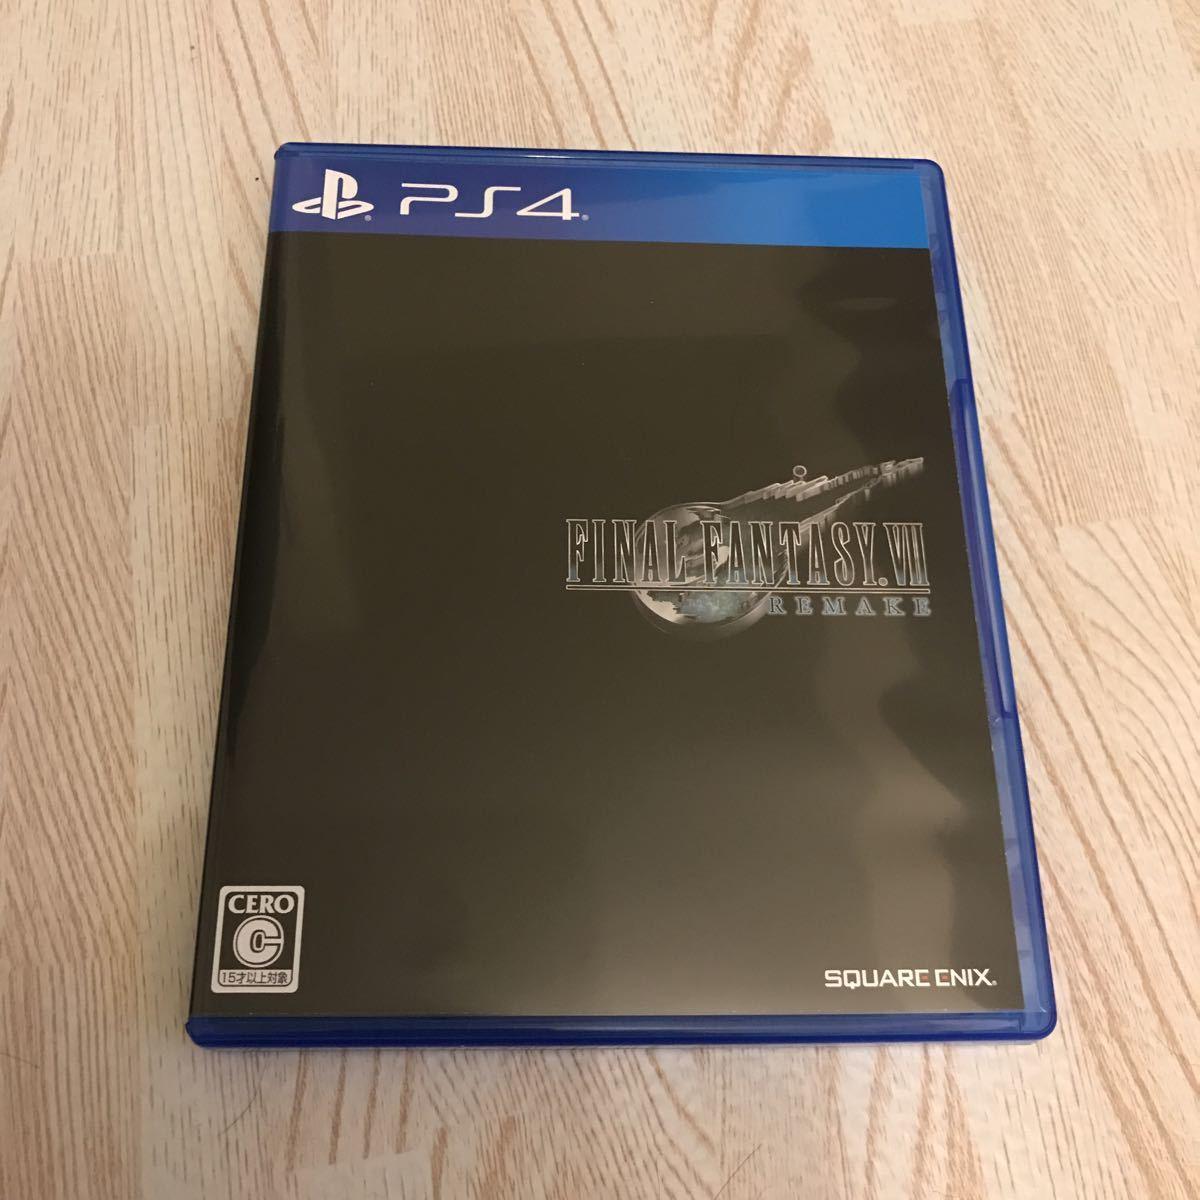 PS4 ファイナルファンタジーⅦ リメイク FINAL FANTASY VII REMAKE 中古 送料無料 FF7 ファイナルファンタジー7